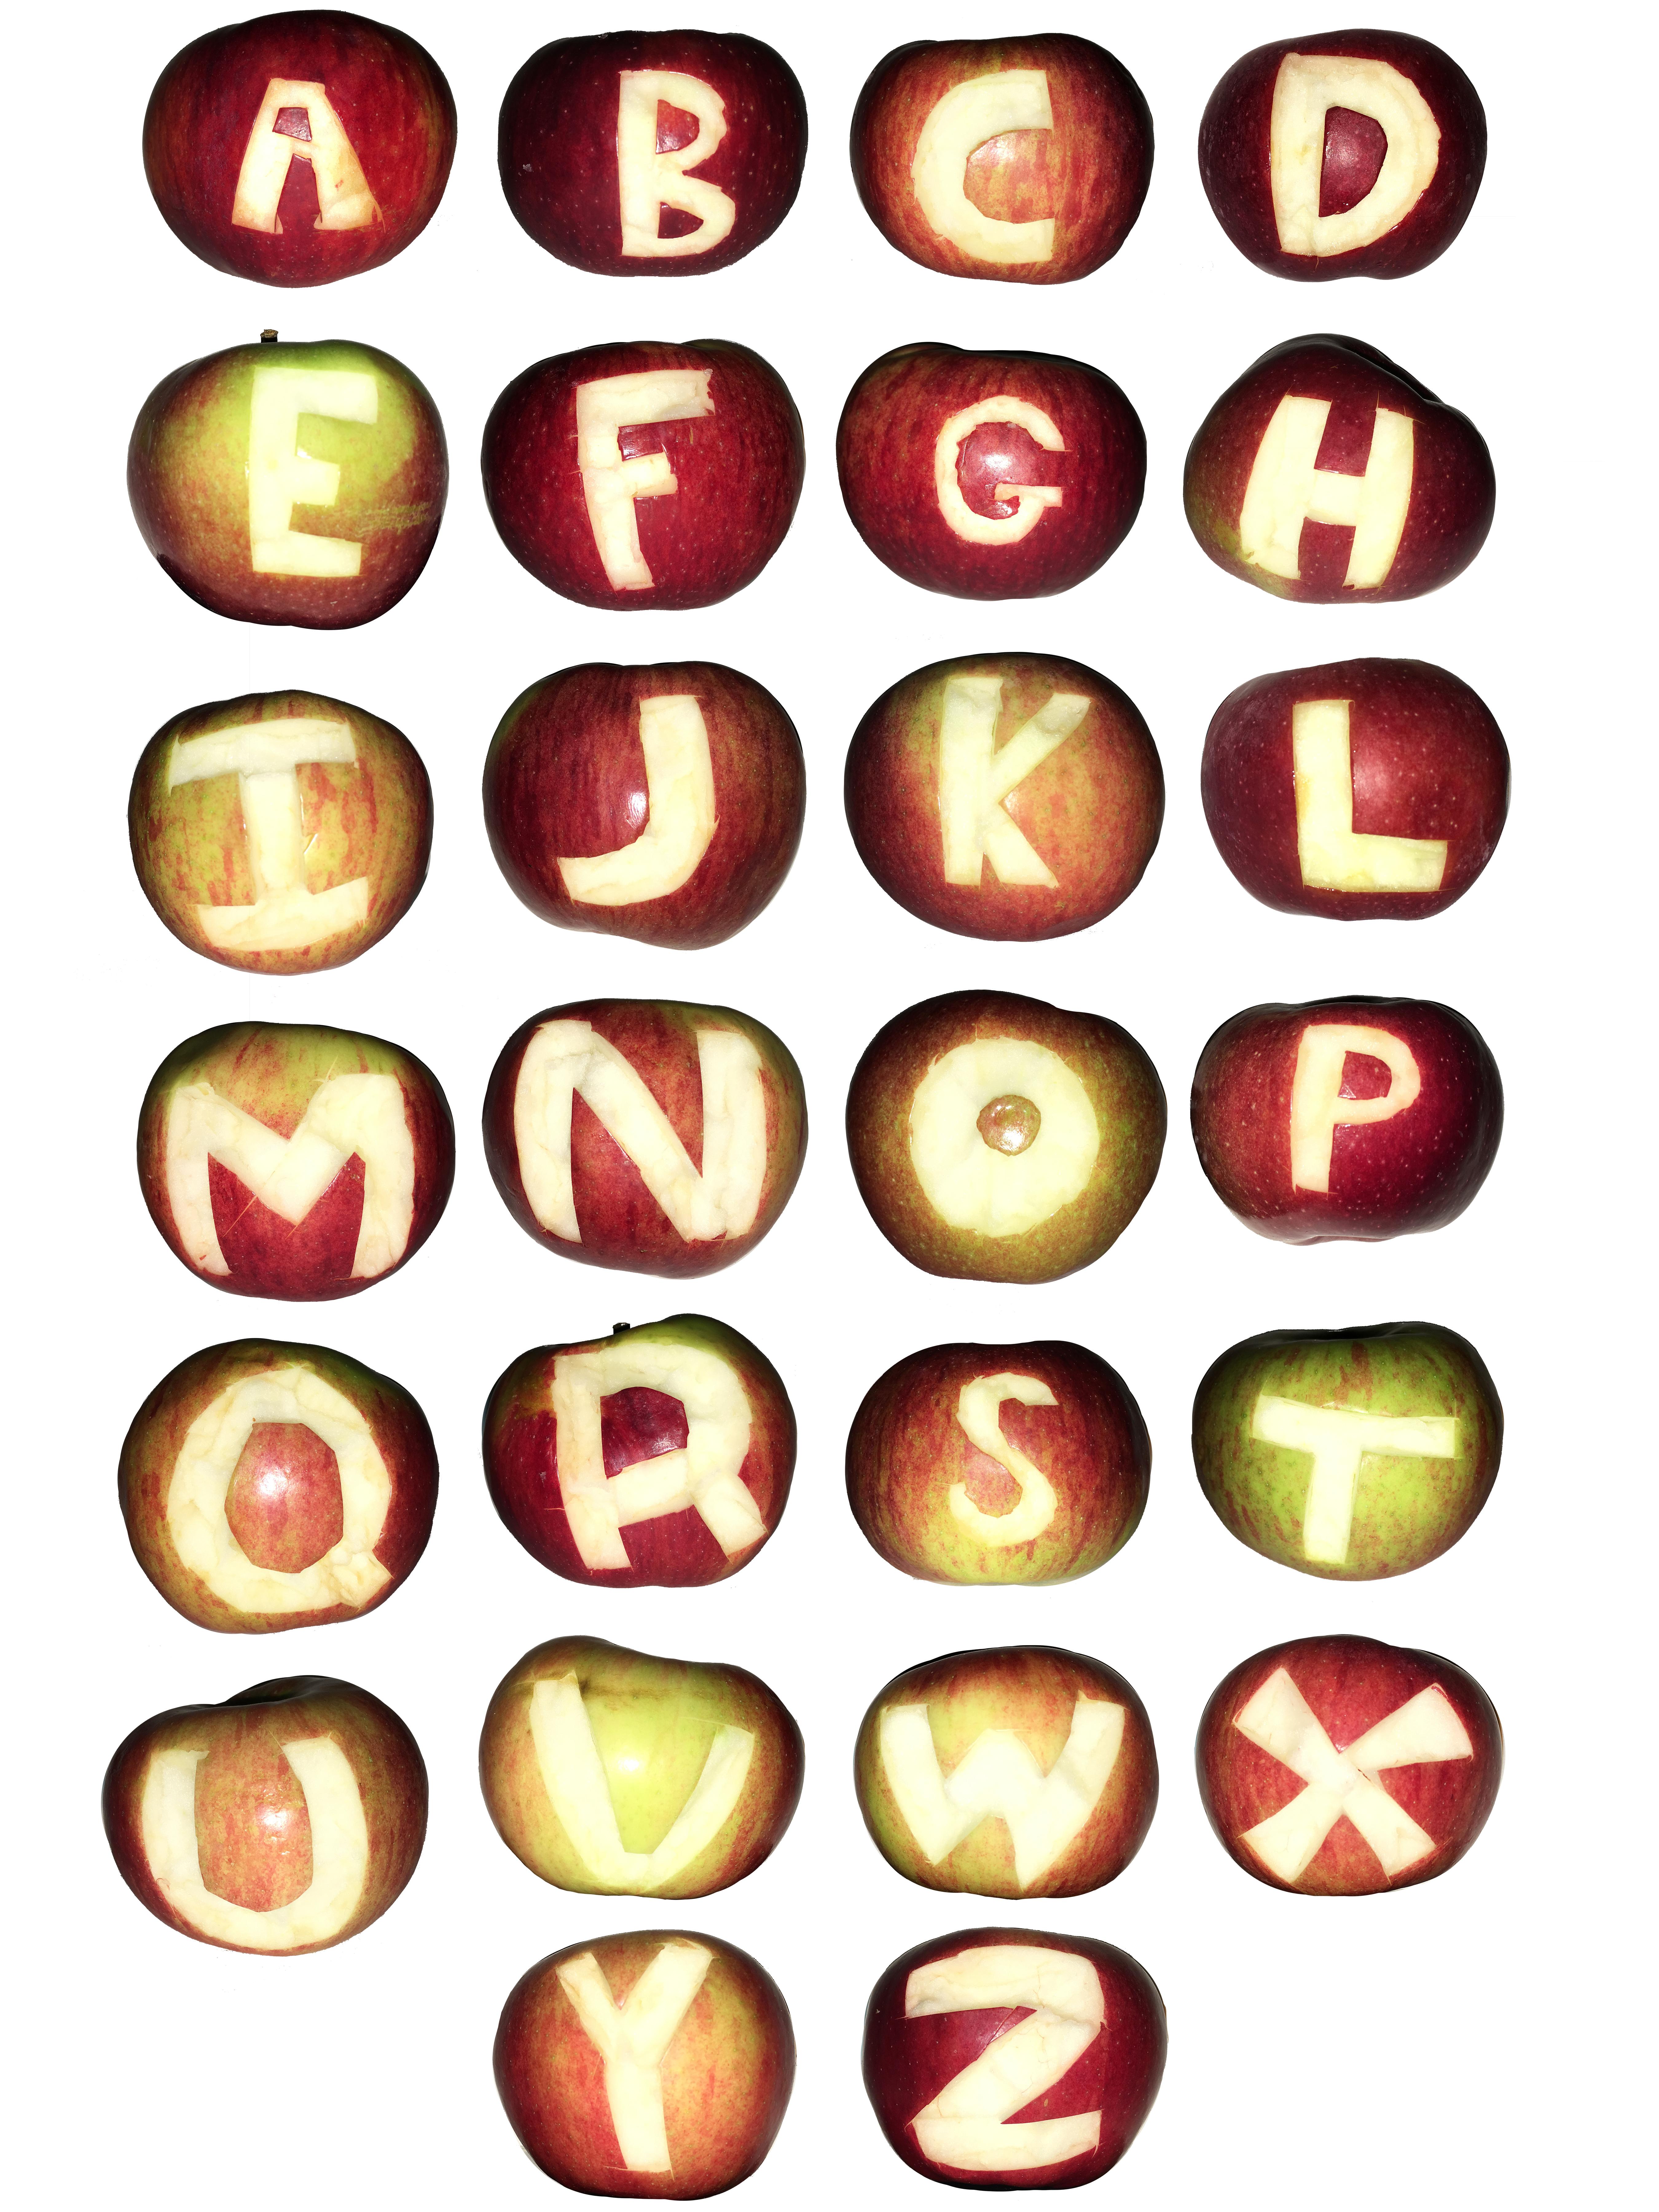 Applebet